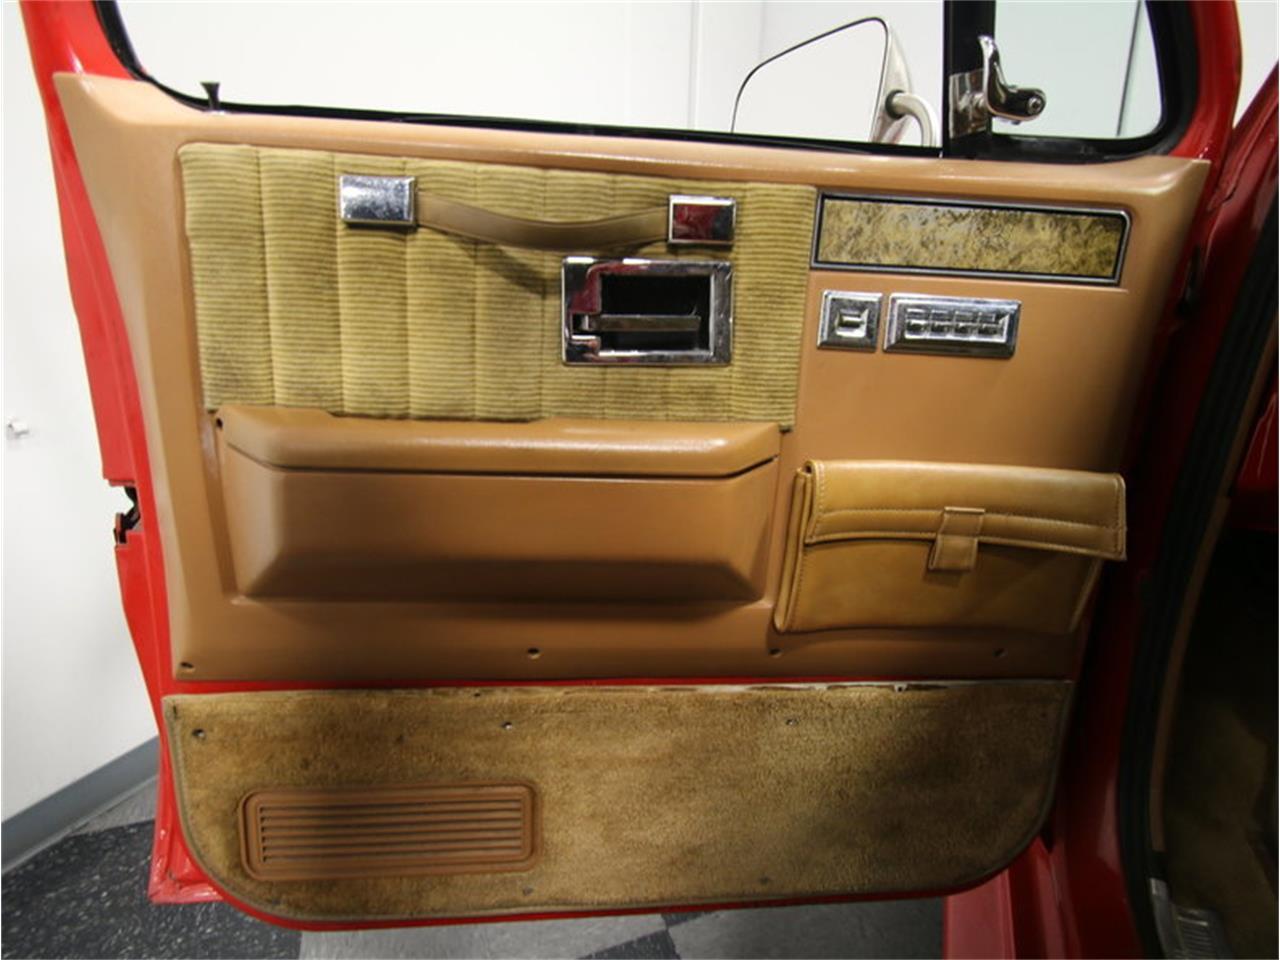 Large Picture of '85 Suburban - $11,995.00 Offered by Streetside Classics - Atlanta - KIU1